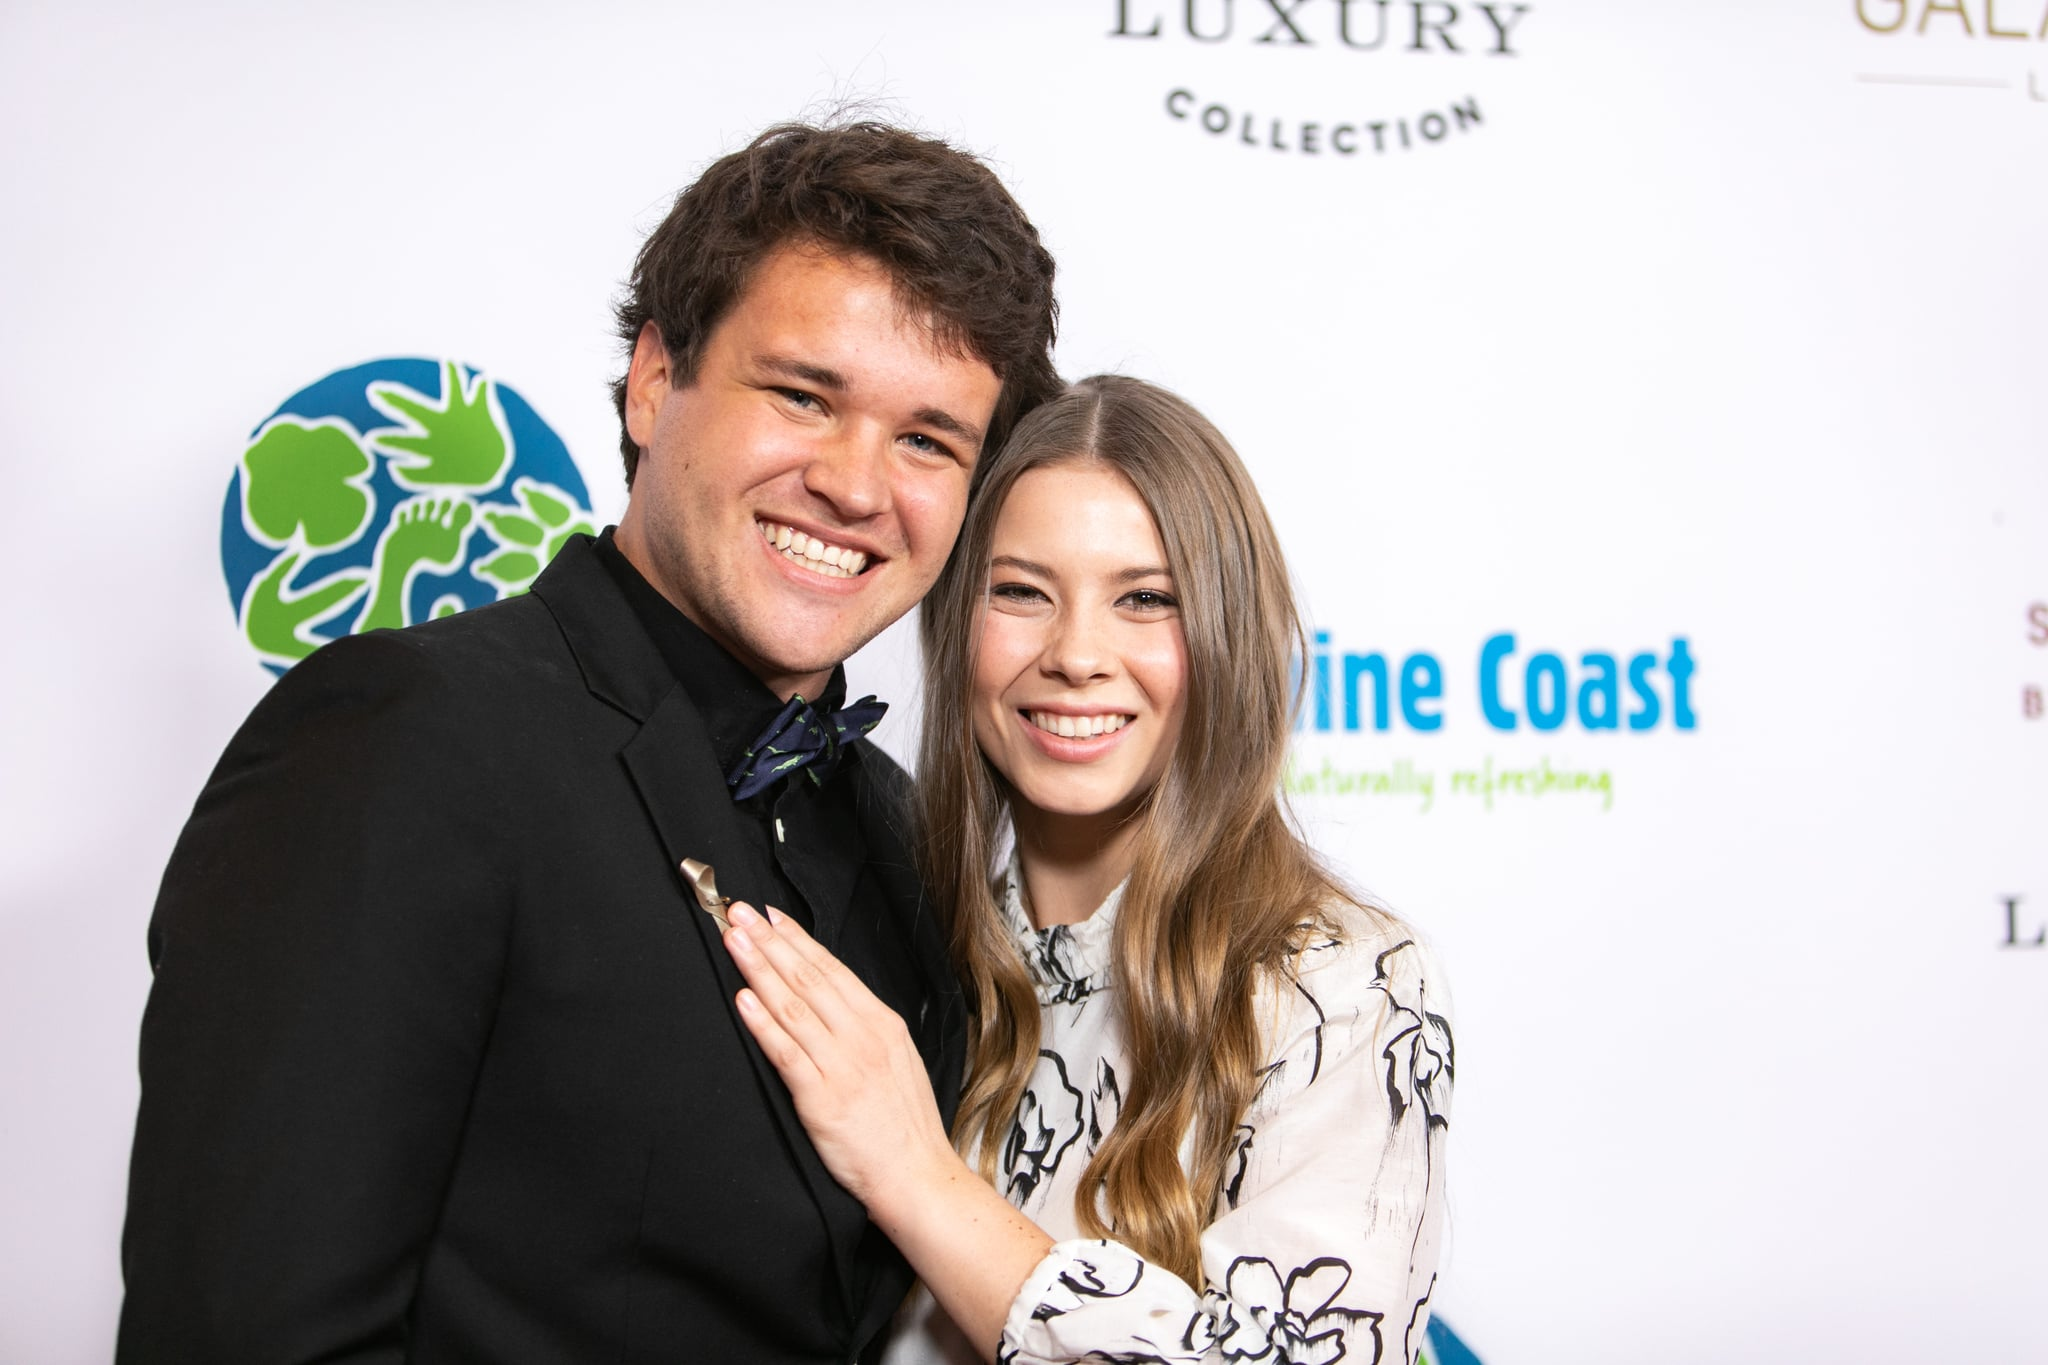 BEVERLY HILLS, CALIFORNIA - MAY 04: Chandler Powell and Bindi Irwin attend the Steve Irwin Gala Dinner at SLS Hotel on May 04, 2019 in Beverly Hills, California. (Photo by John Wolfsohn/Getty Images)